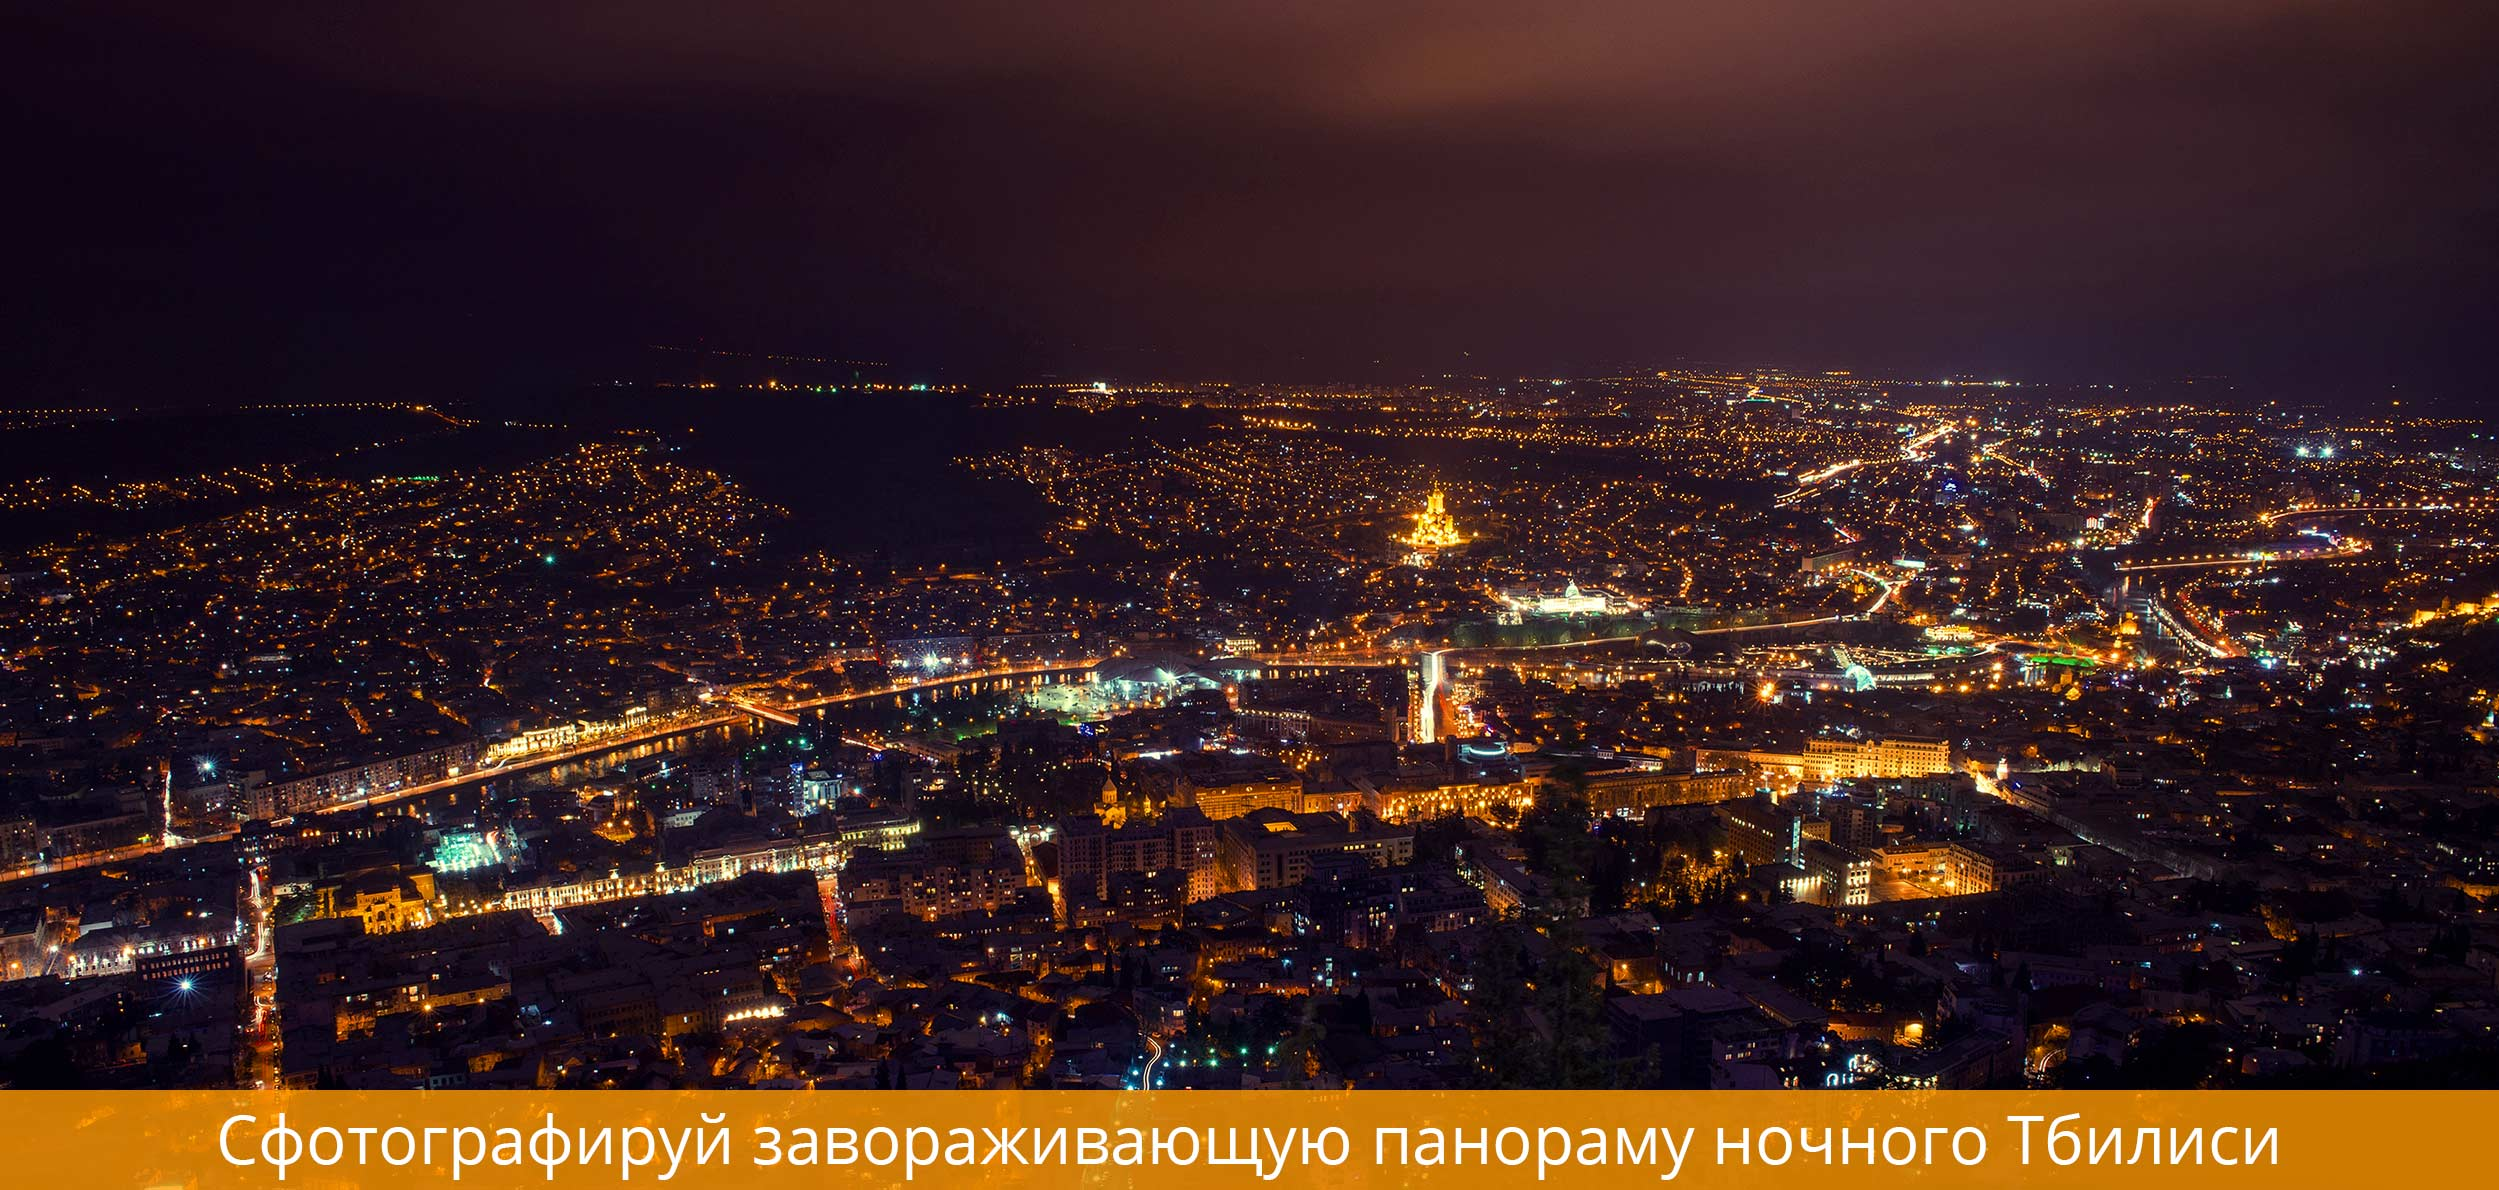 Ночной Тбилиси Панорама